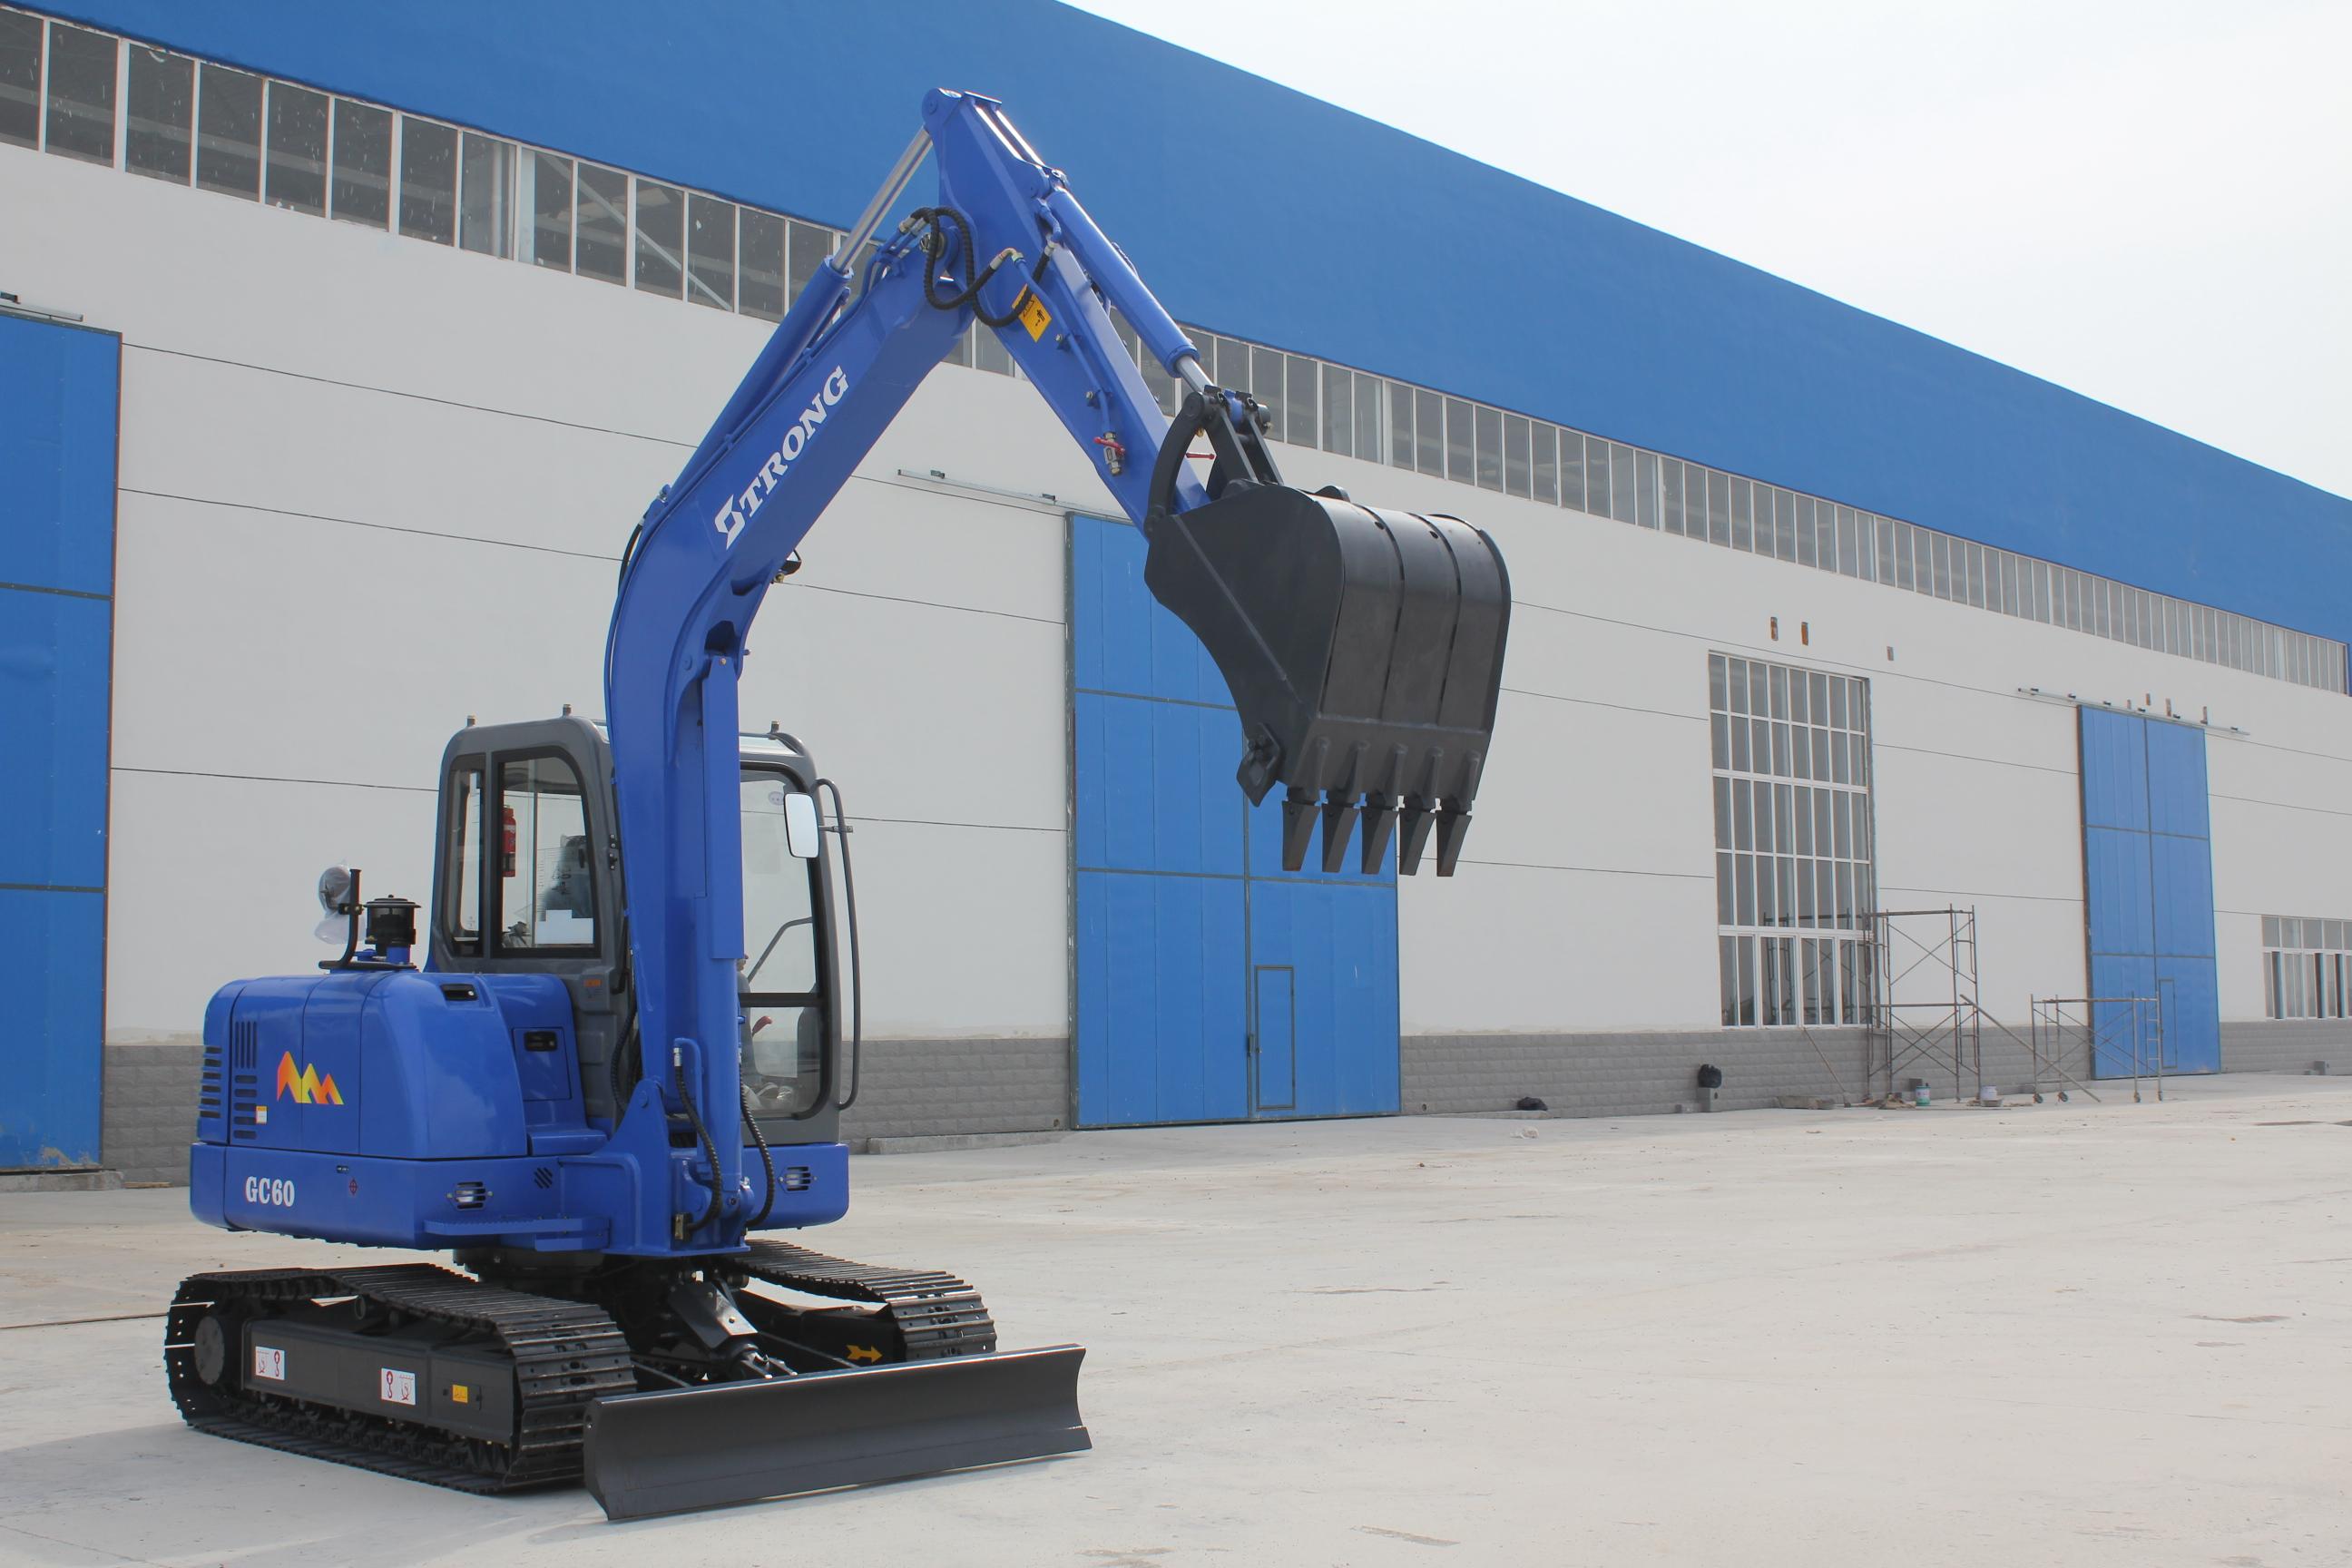 GC60-8 Hydraulic Crawler Excavator